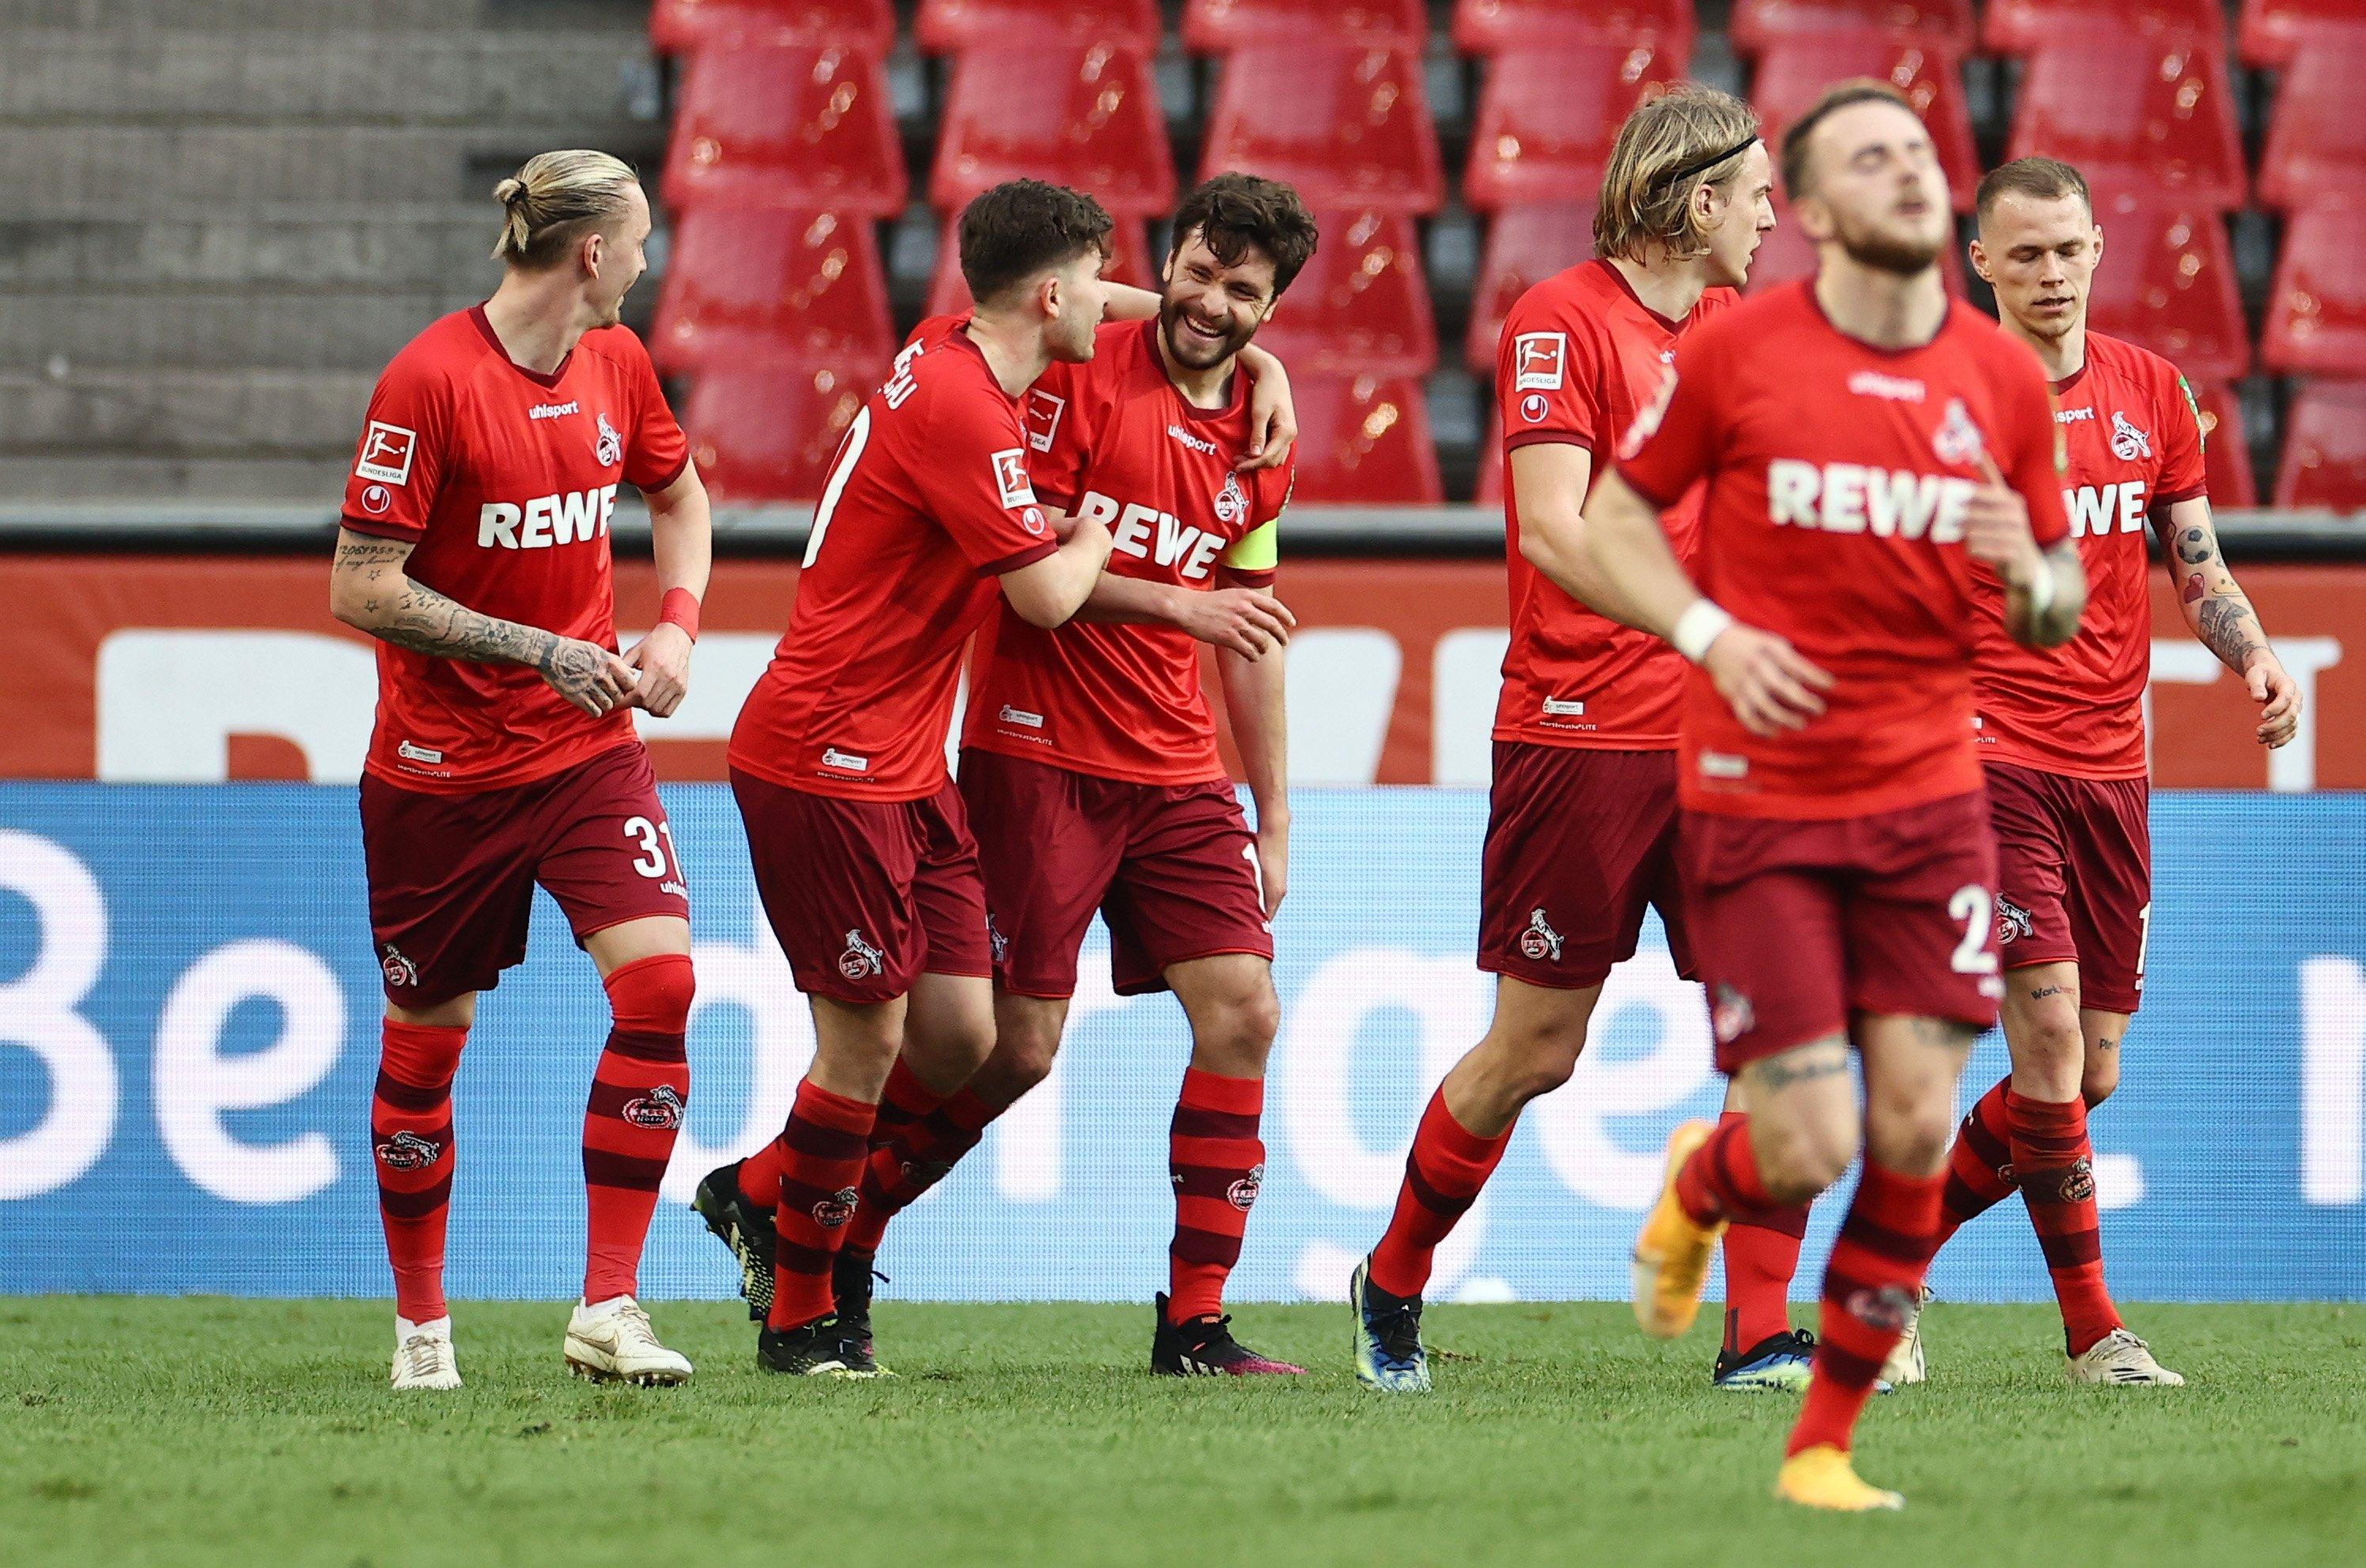 1 FC Koln's Jonas Hector (C) celebrates scoring their second goal against RB Leipzig with teammates during Bundesliga match on April 20, 2021. (Rolf Vennenbernd/DFL/Pool via Reuters)